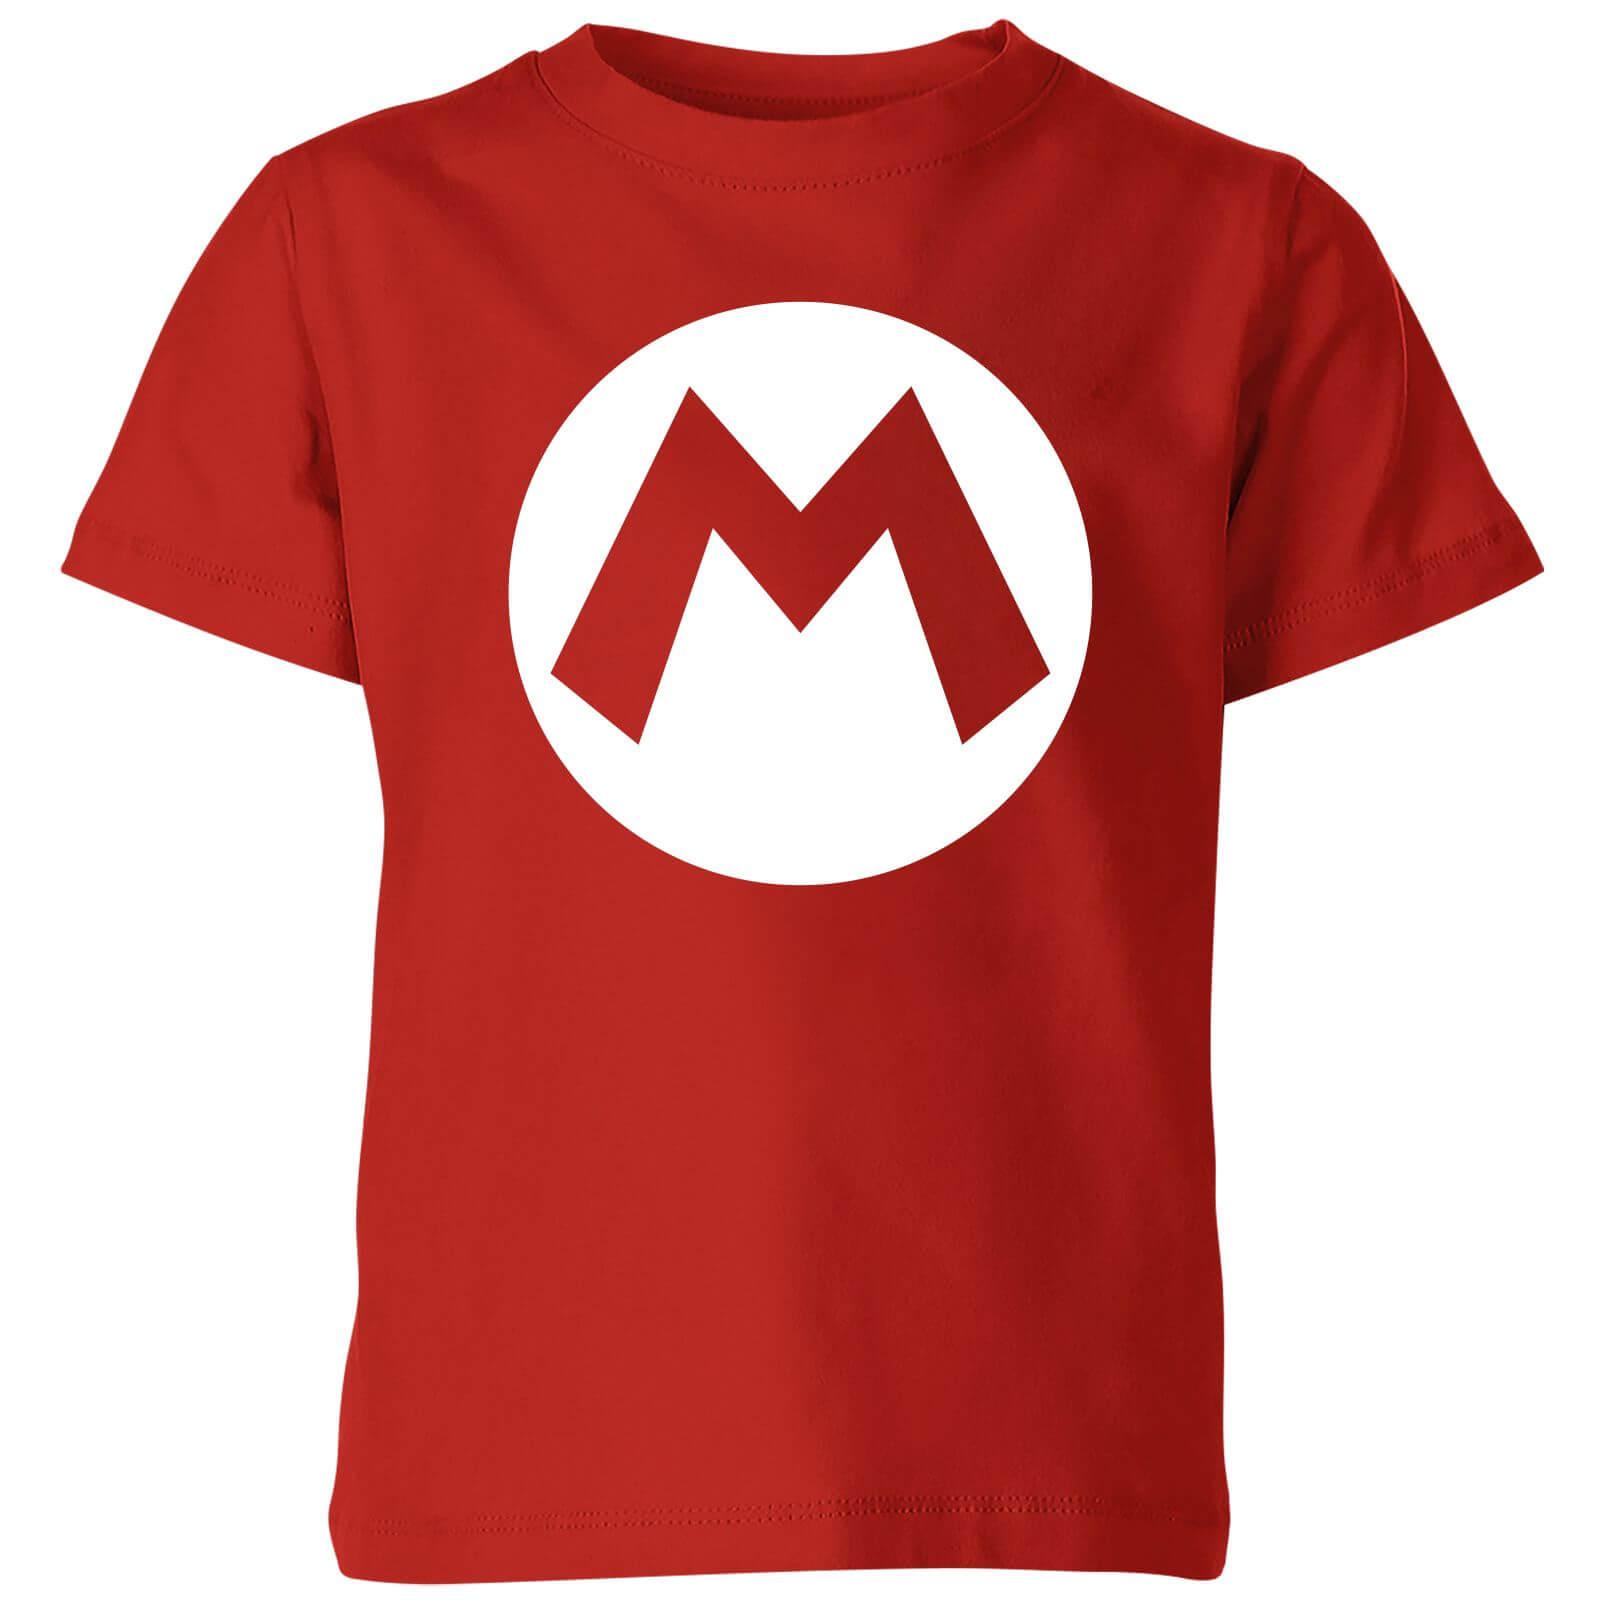 2 x Kinder T-Shirts (Nintendo, NASA, Harry Potter, Star Wars u.v.m.) für 11,35€ @ iwantoneofthose.com